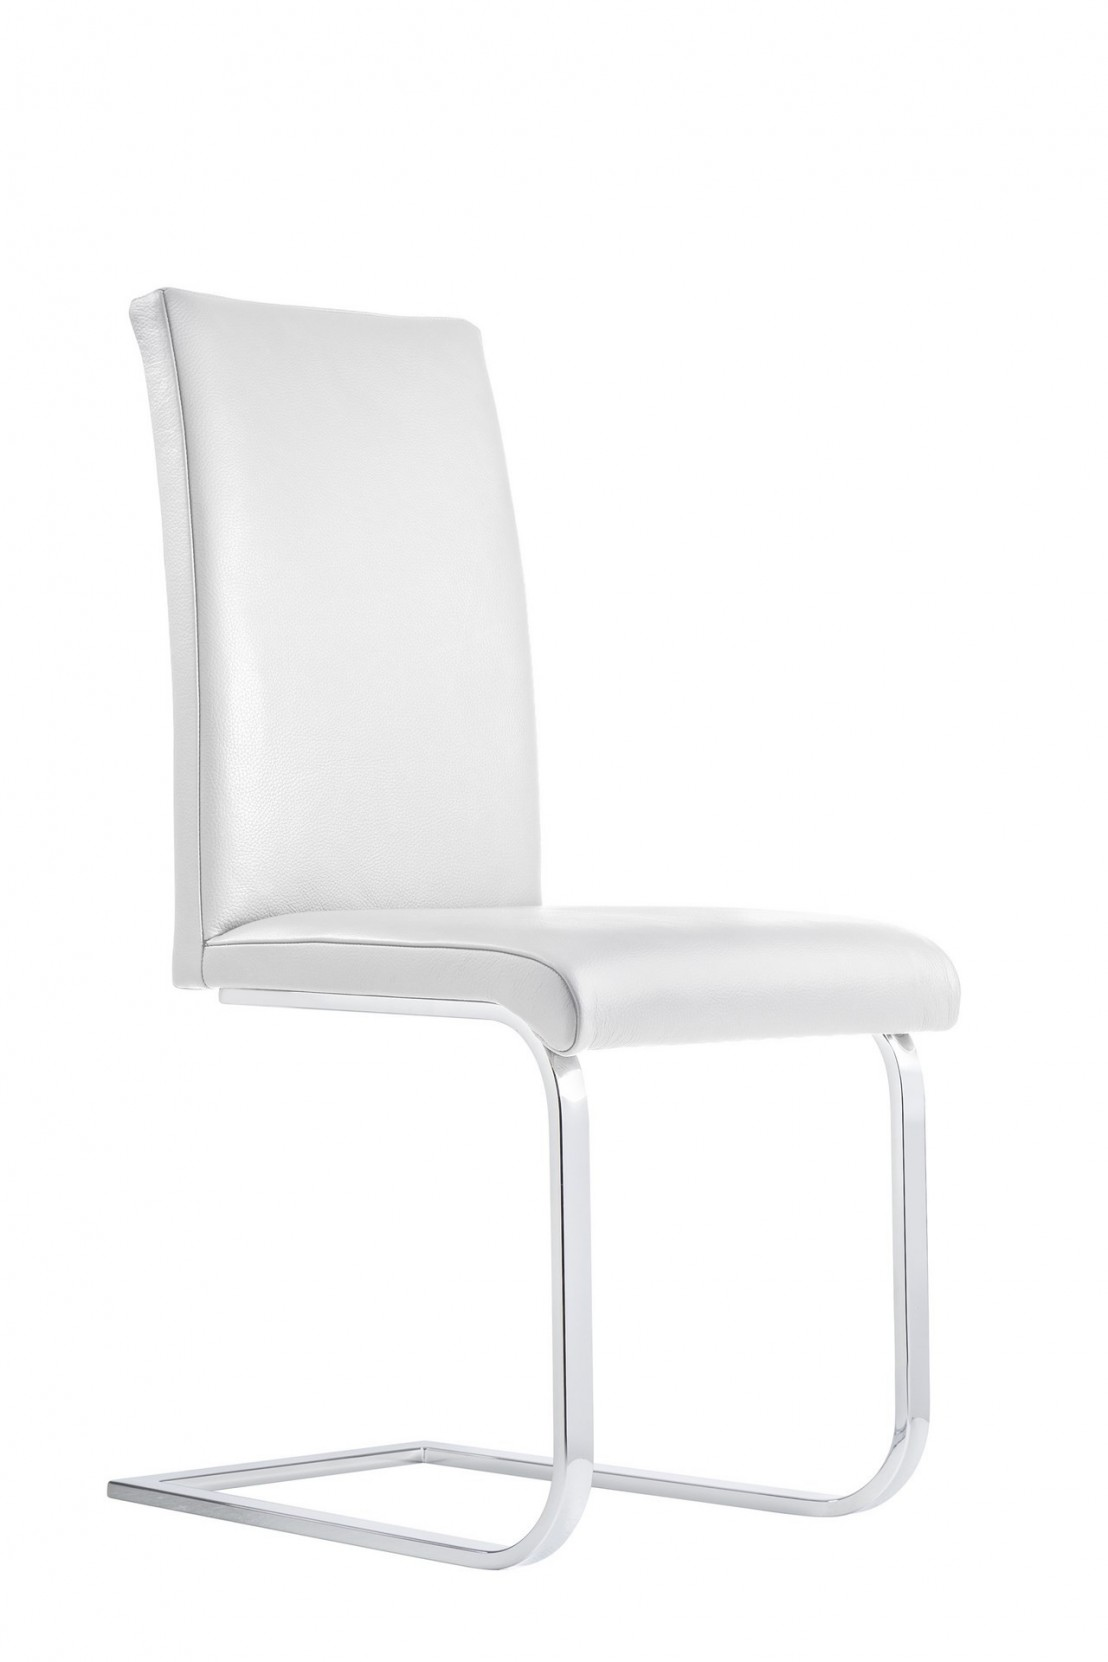 chaises design lofty m 4 pieds ou luge cuir ou tissu. Black Bedroom Furniture Sets. Home Design Ideas